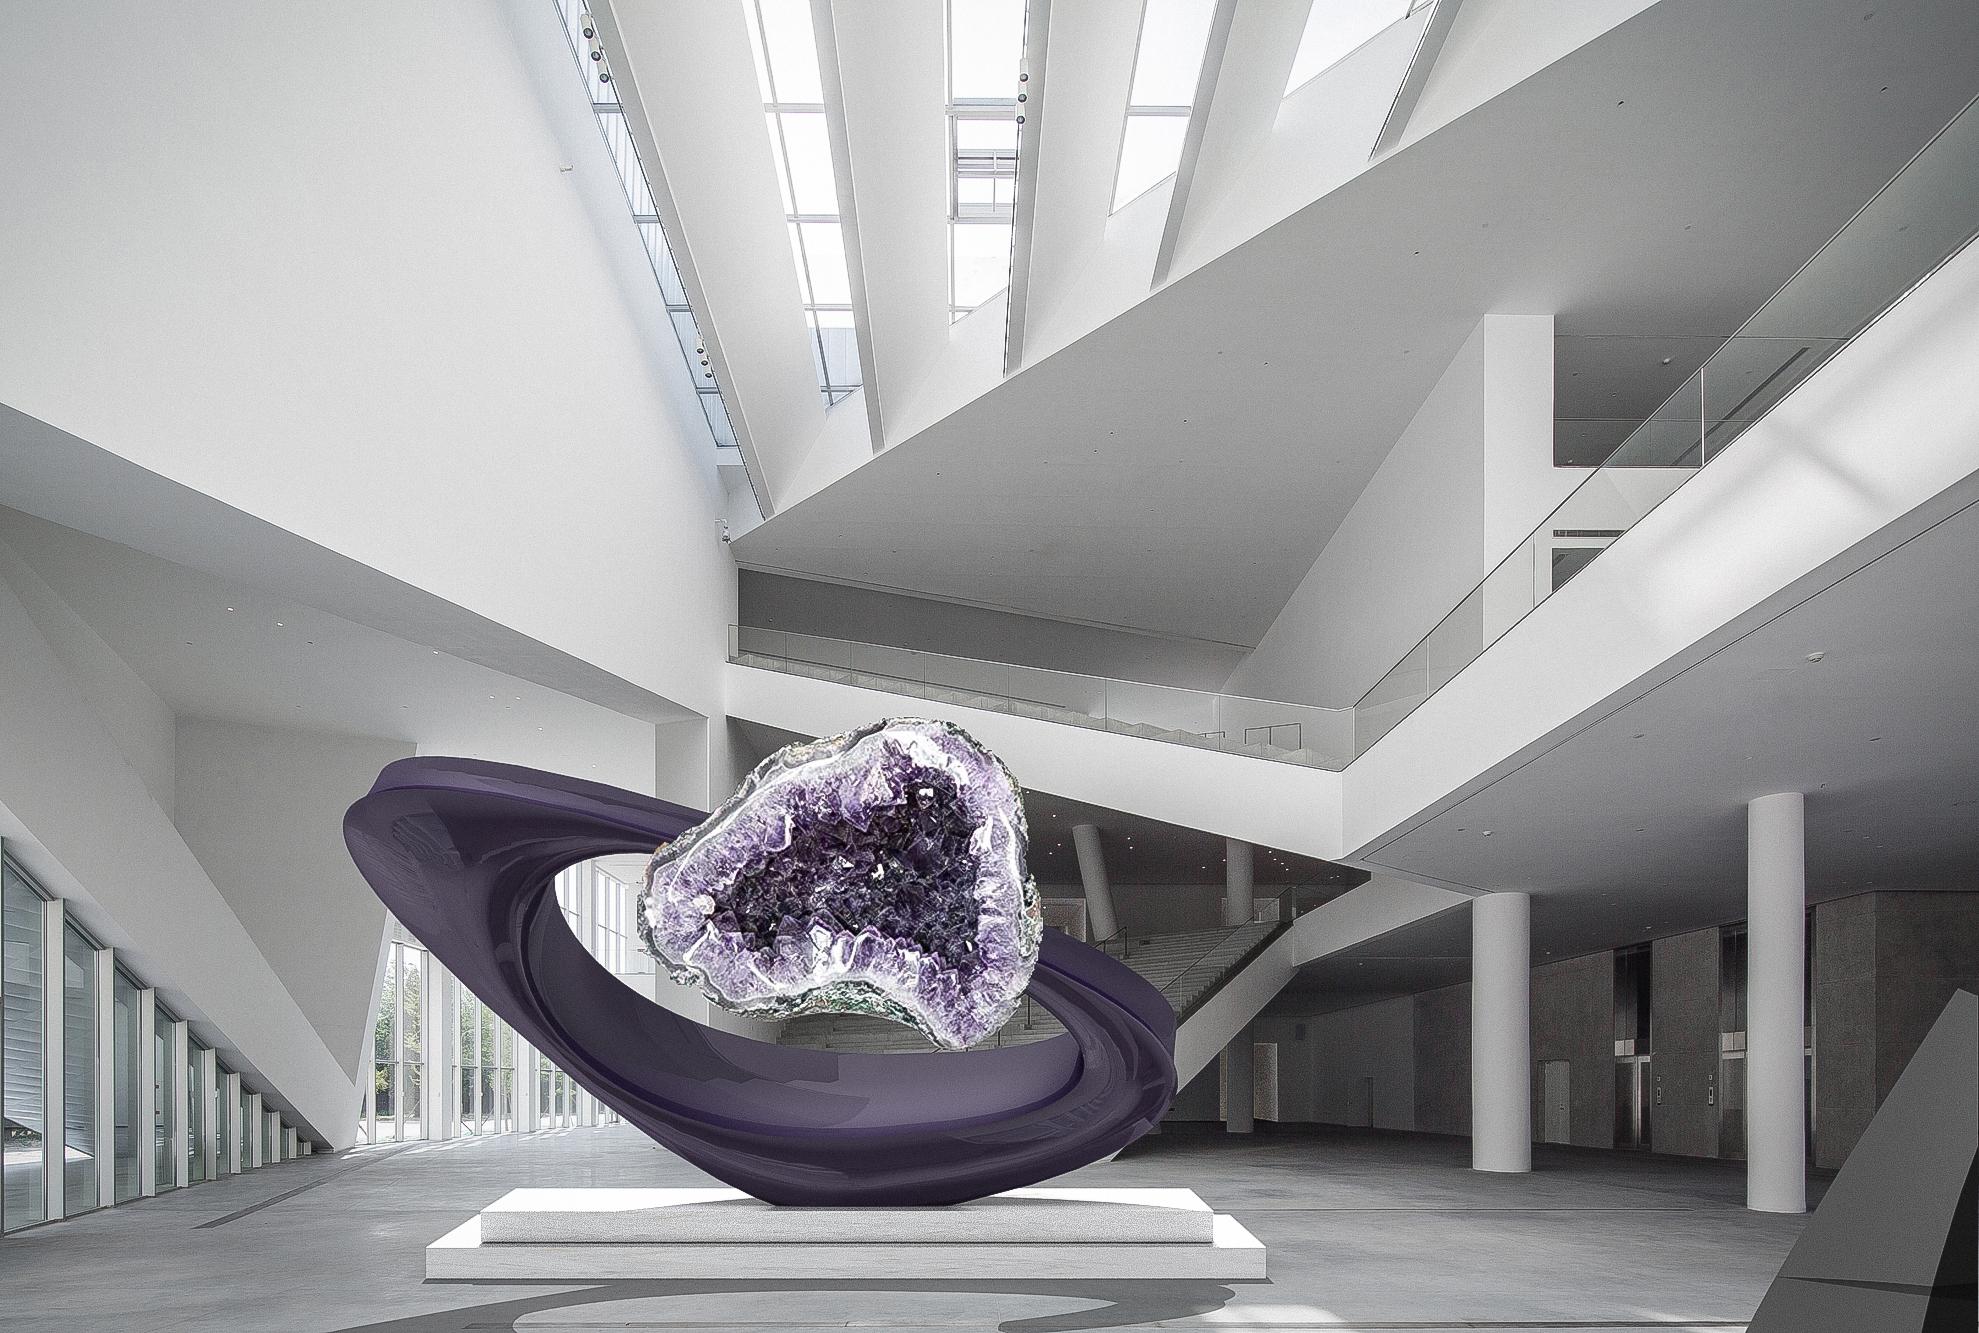 geode sculpture